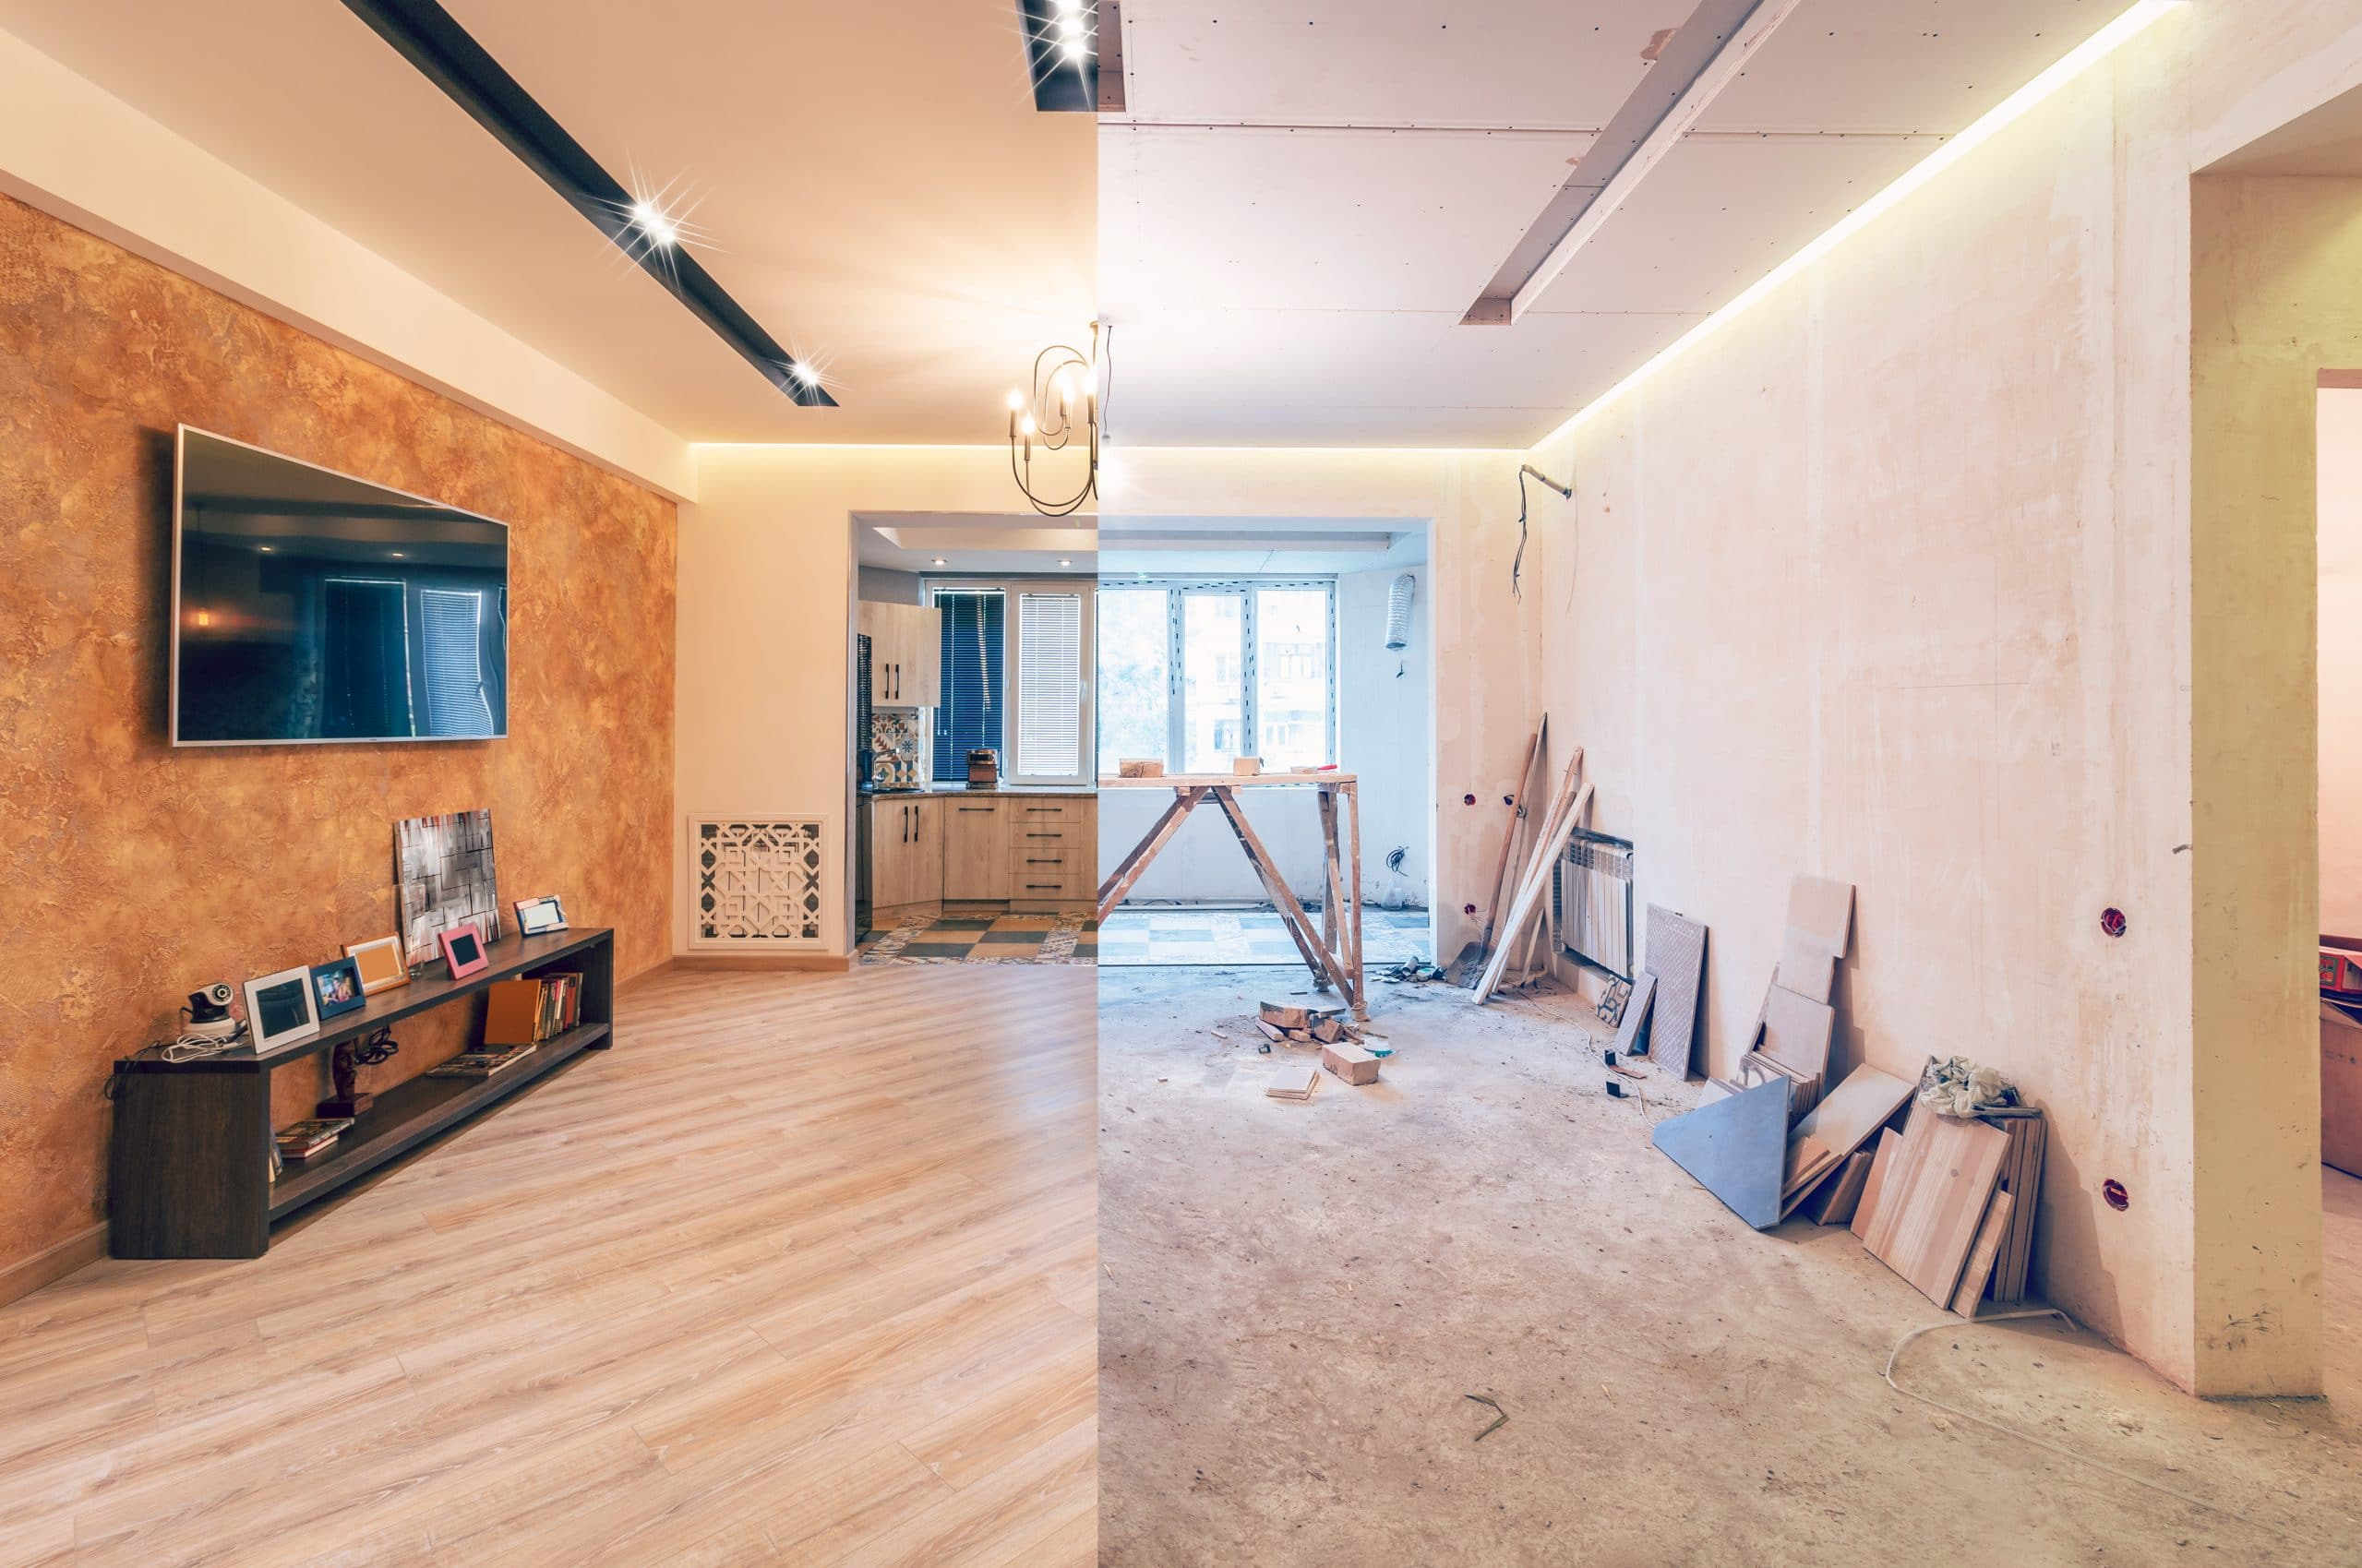 Modern interior design of big living-kitchen studio room, before and after